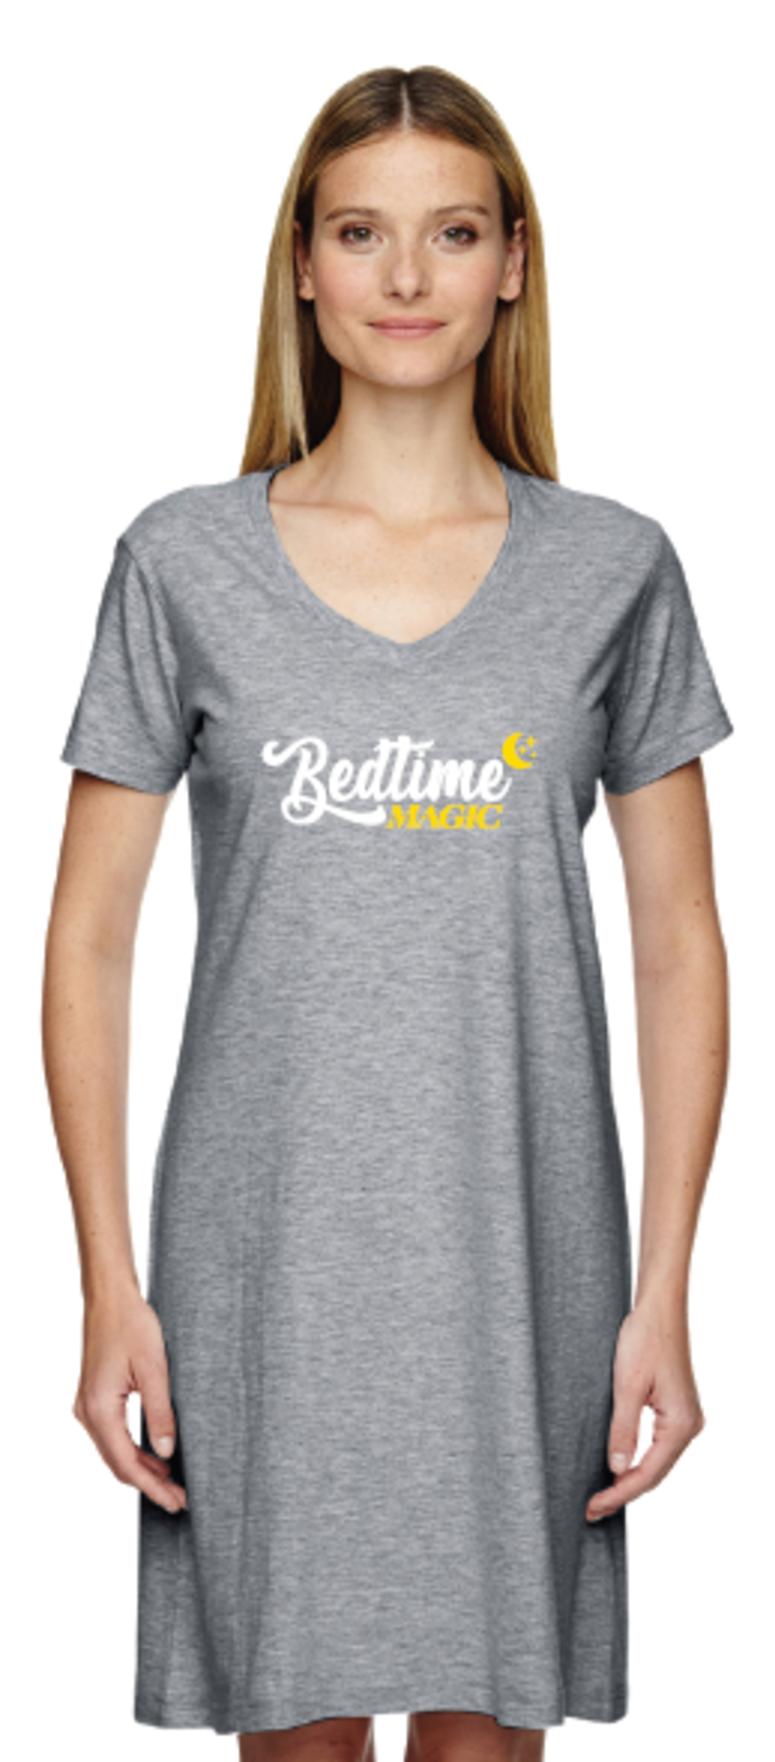 Bedtime Magic Night Shirt